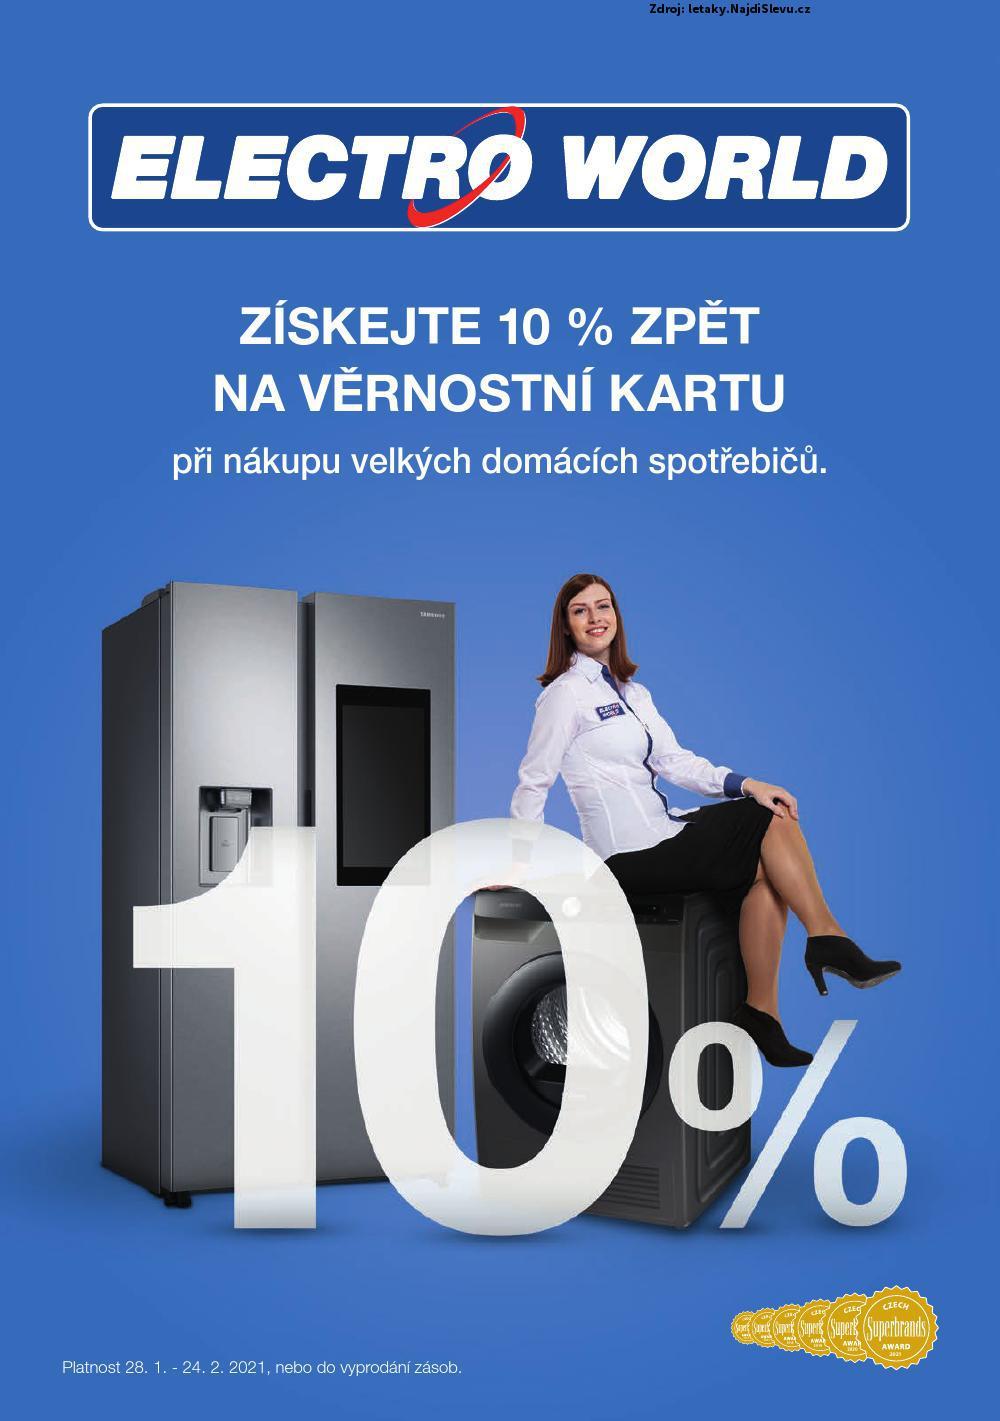 Strana 1 - leták Electro World (28. 1. - 24. 2. 2021)